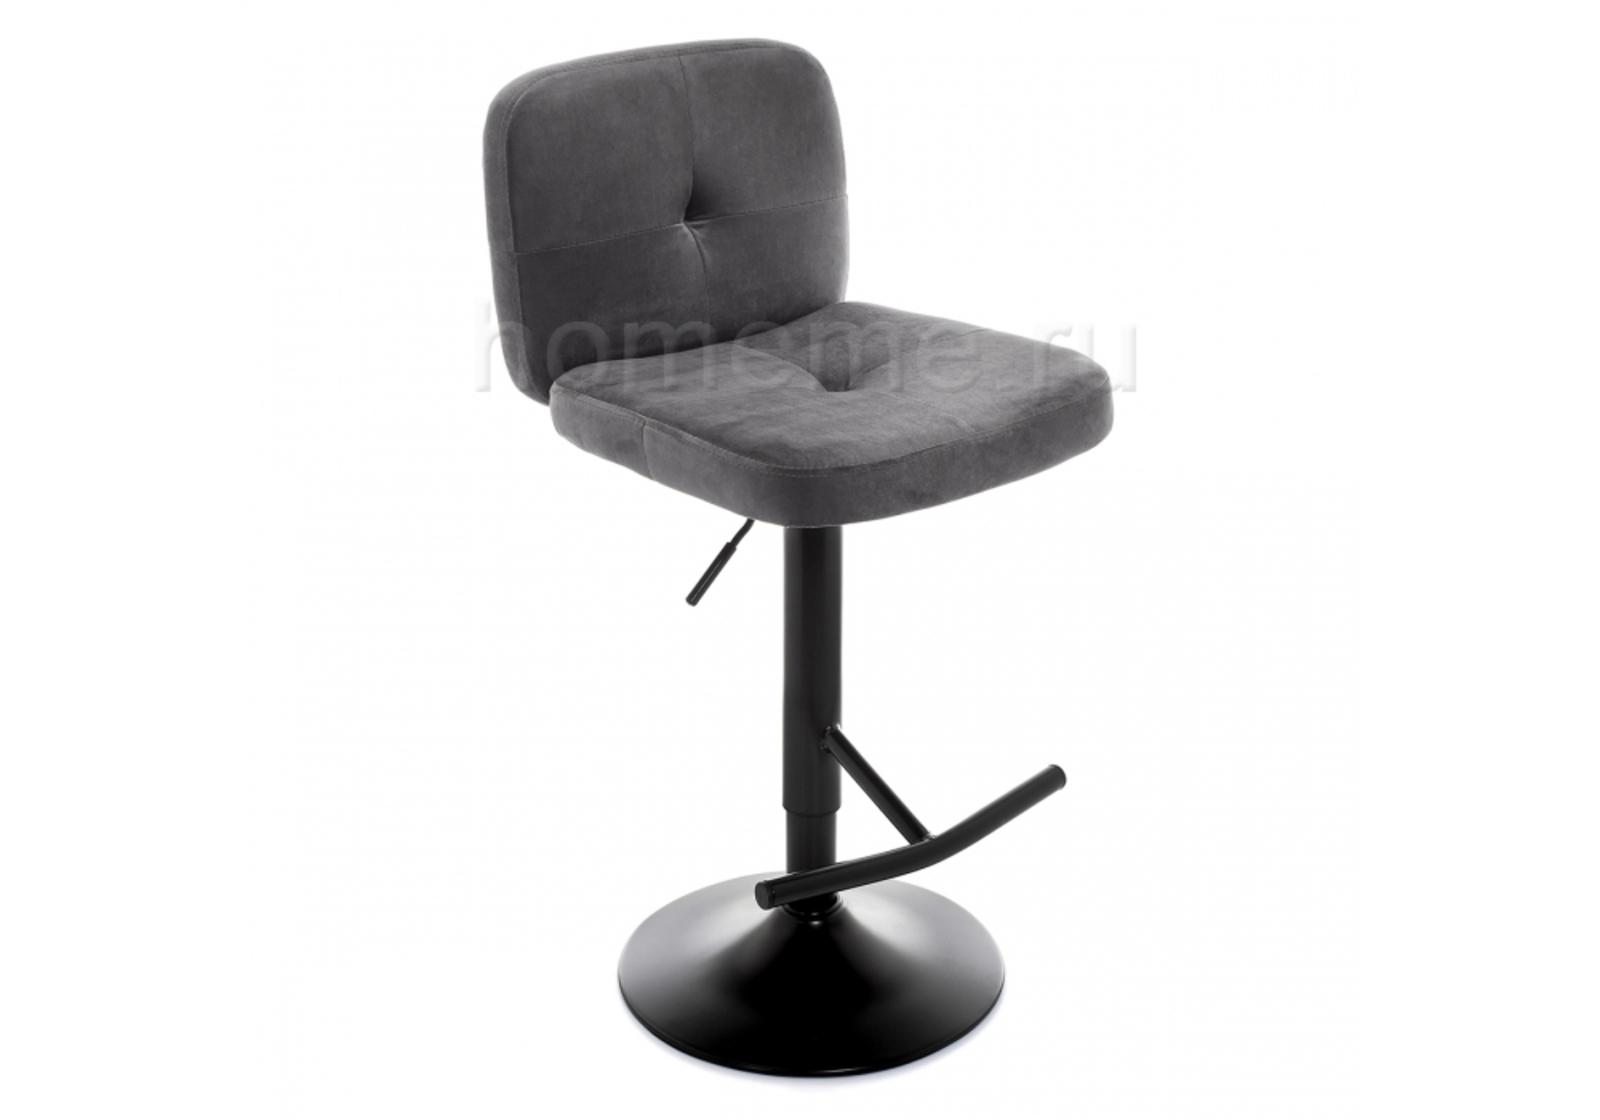 Барный стул Hoom серый 11358 Hoom серый 11358 (17556)